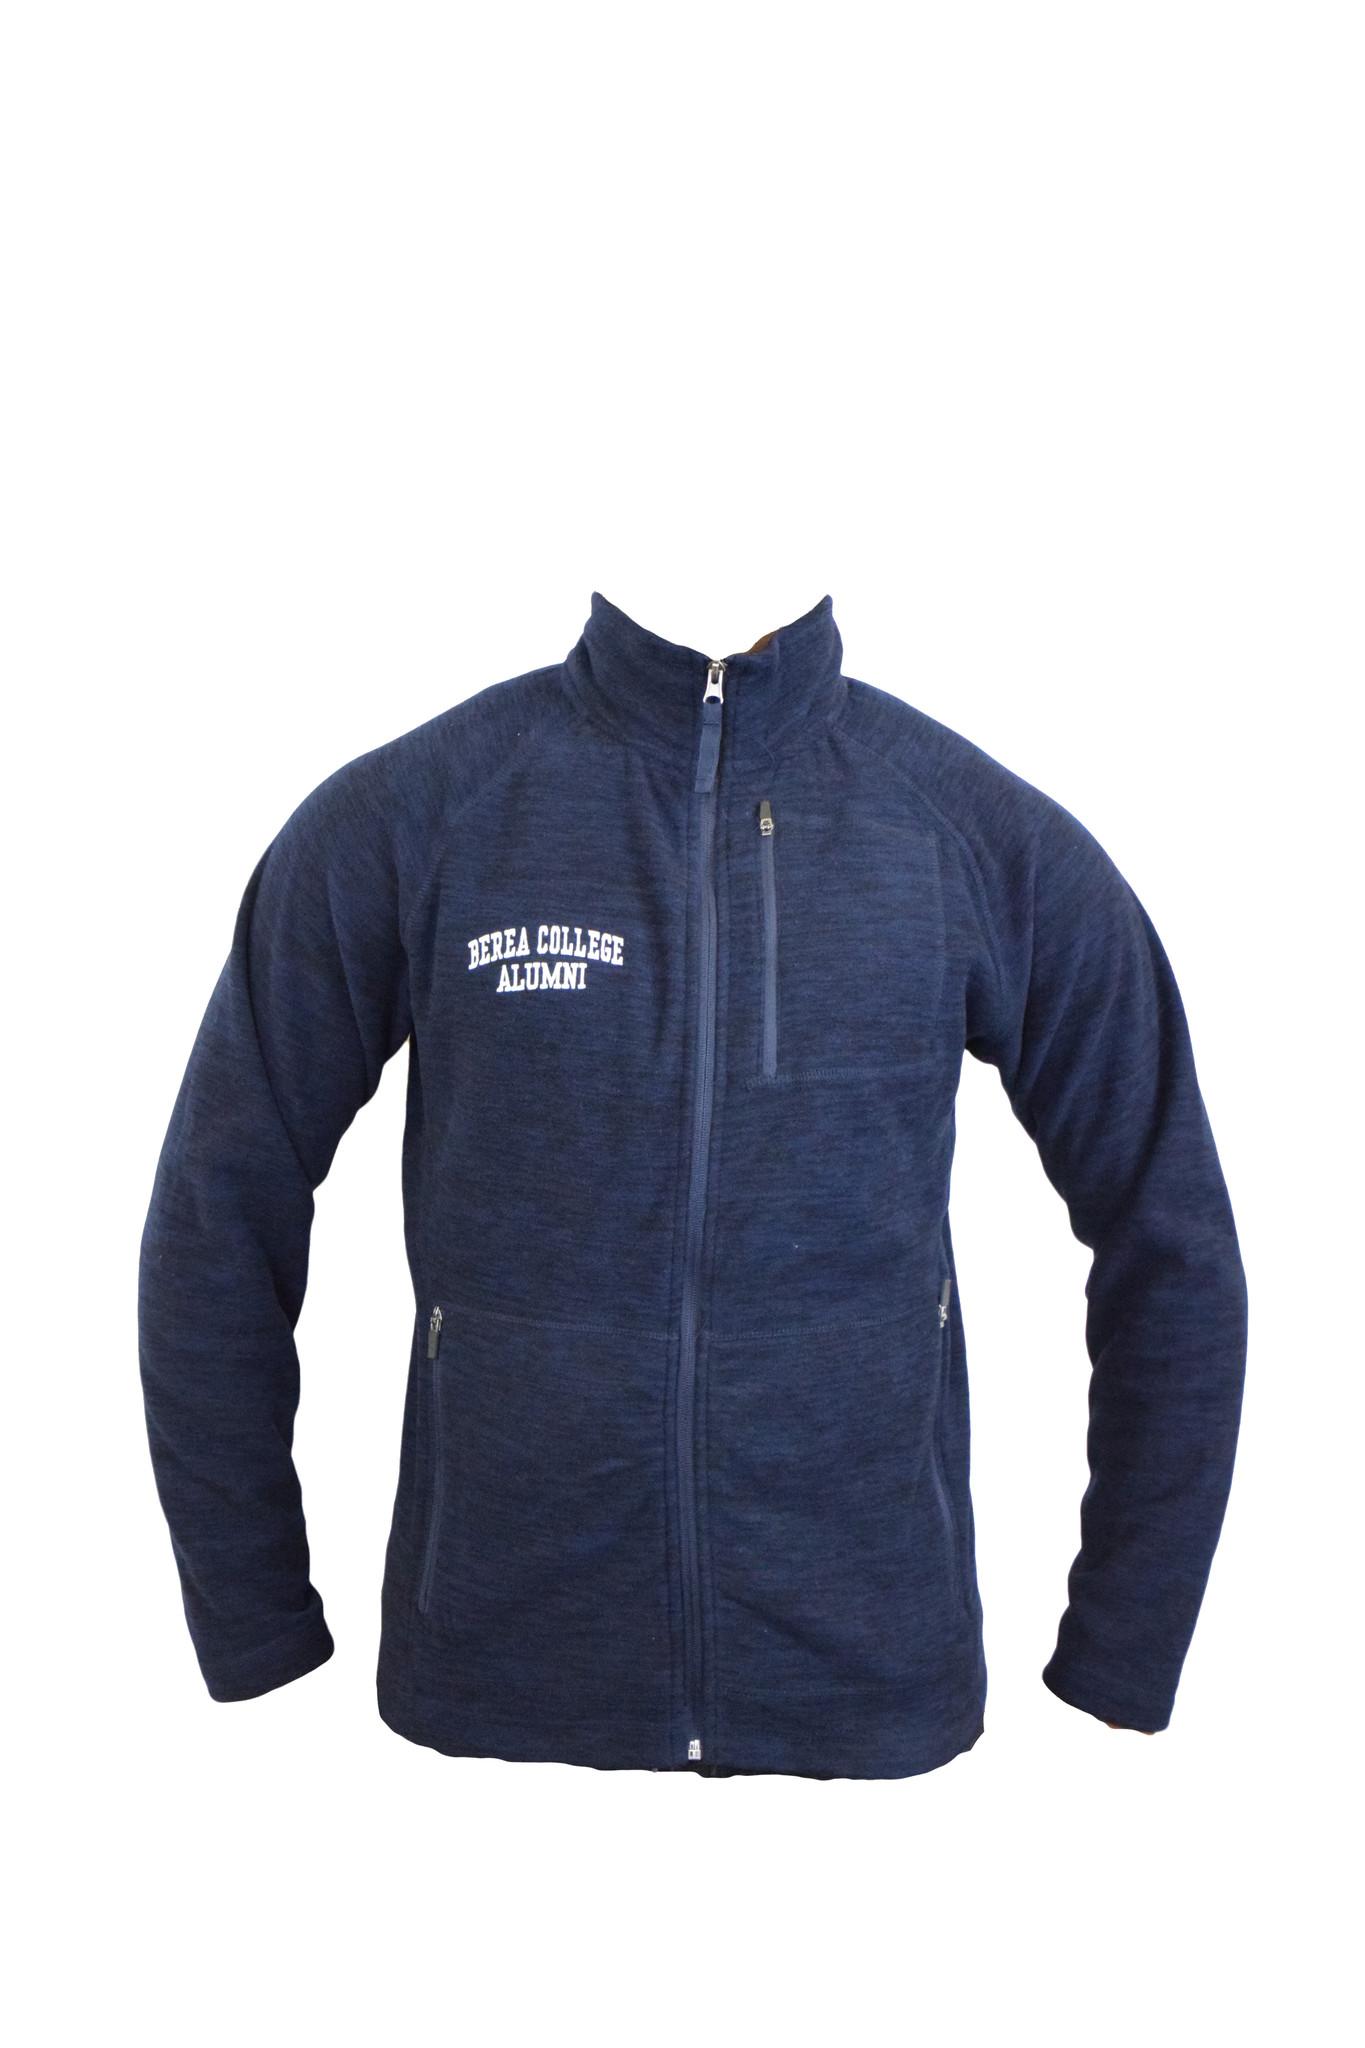 Heathered Navy Alumni Guide Jacket-2